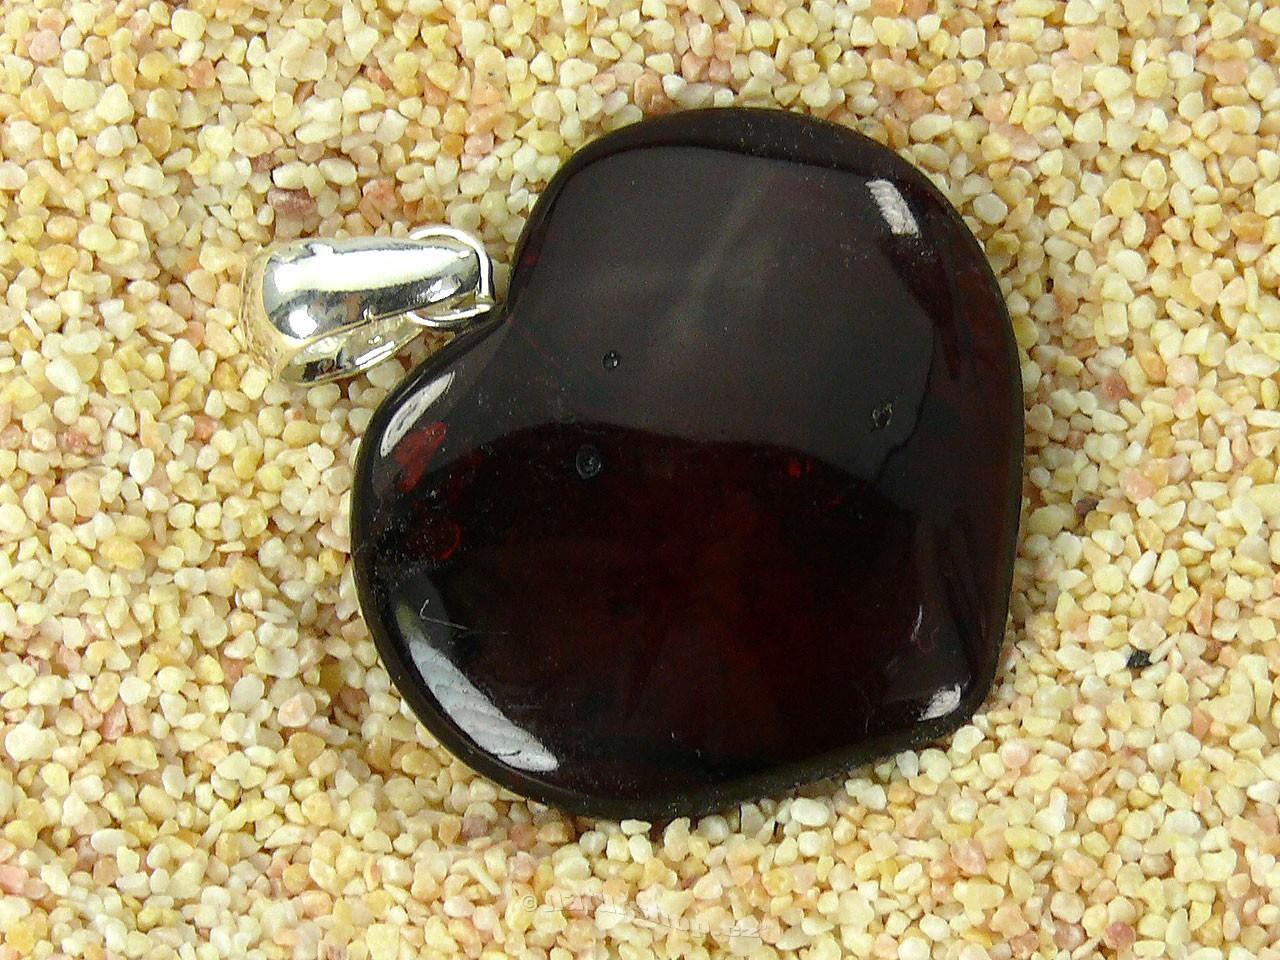 Přívěsek jantar tmavé srdce stříbrný úchyt 2,7g